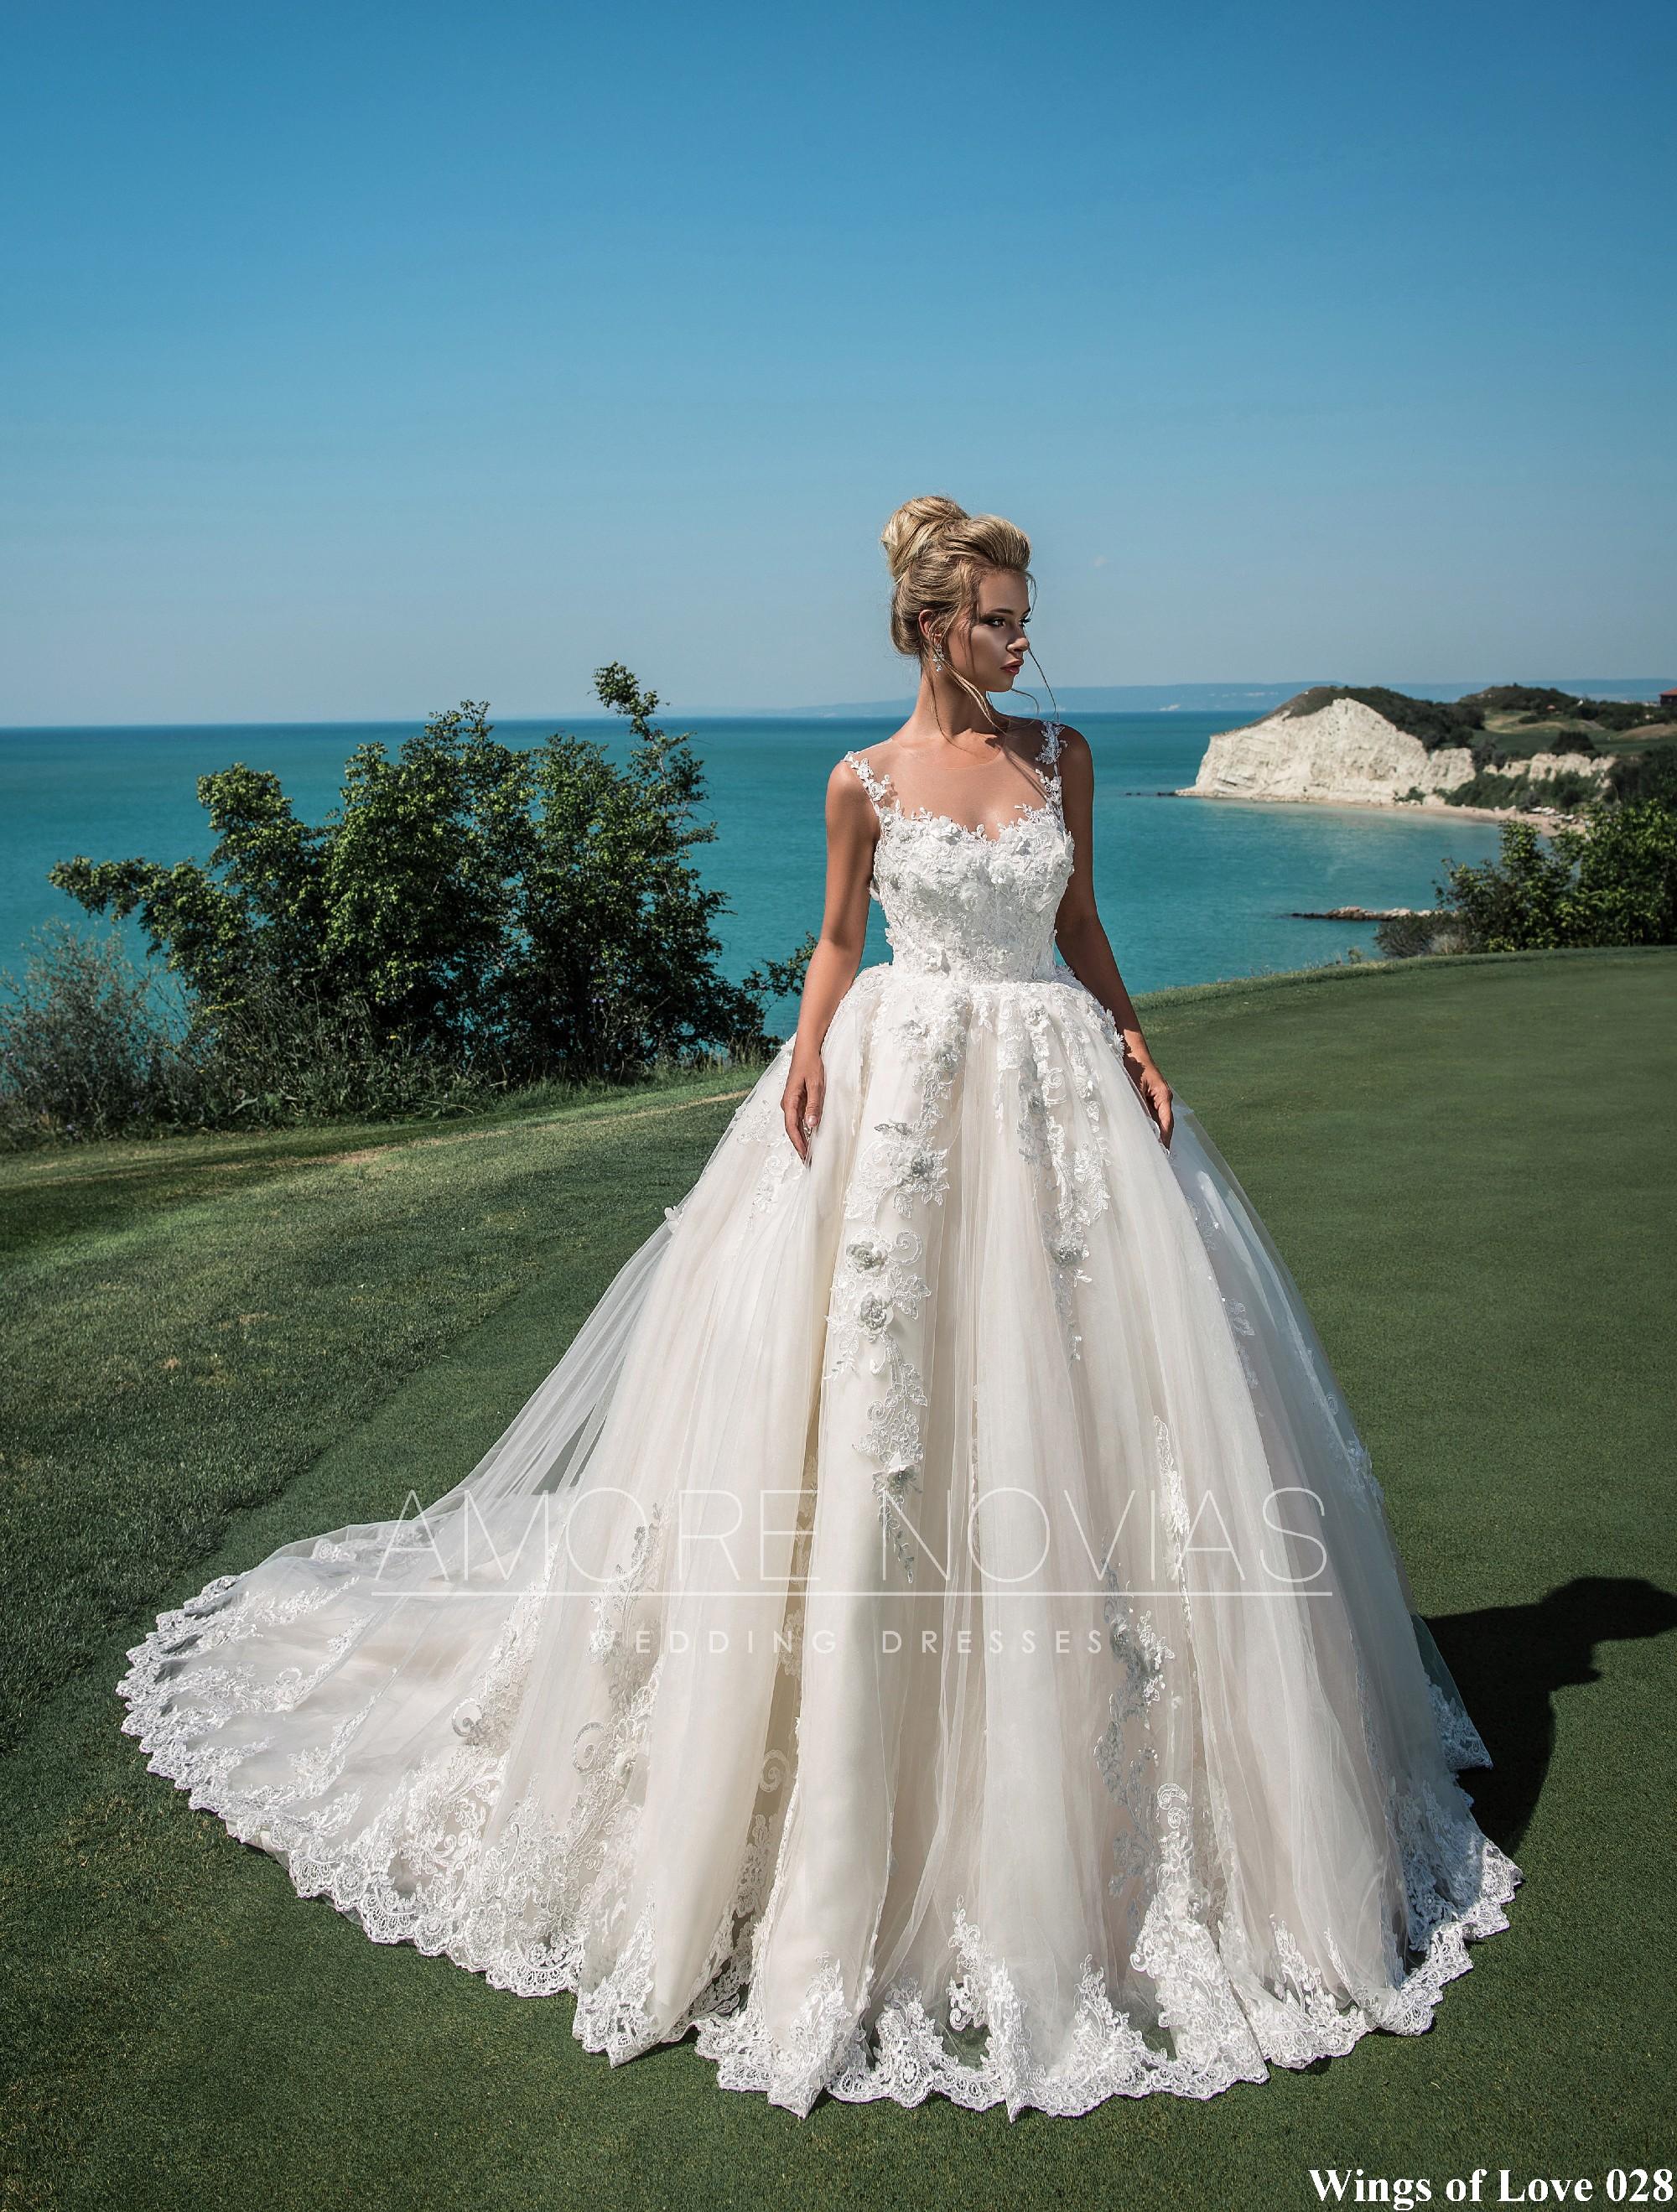 http://amore-novias.com/images/stories/virtuemart/product/lk-028-------(1).jpg